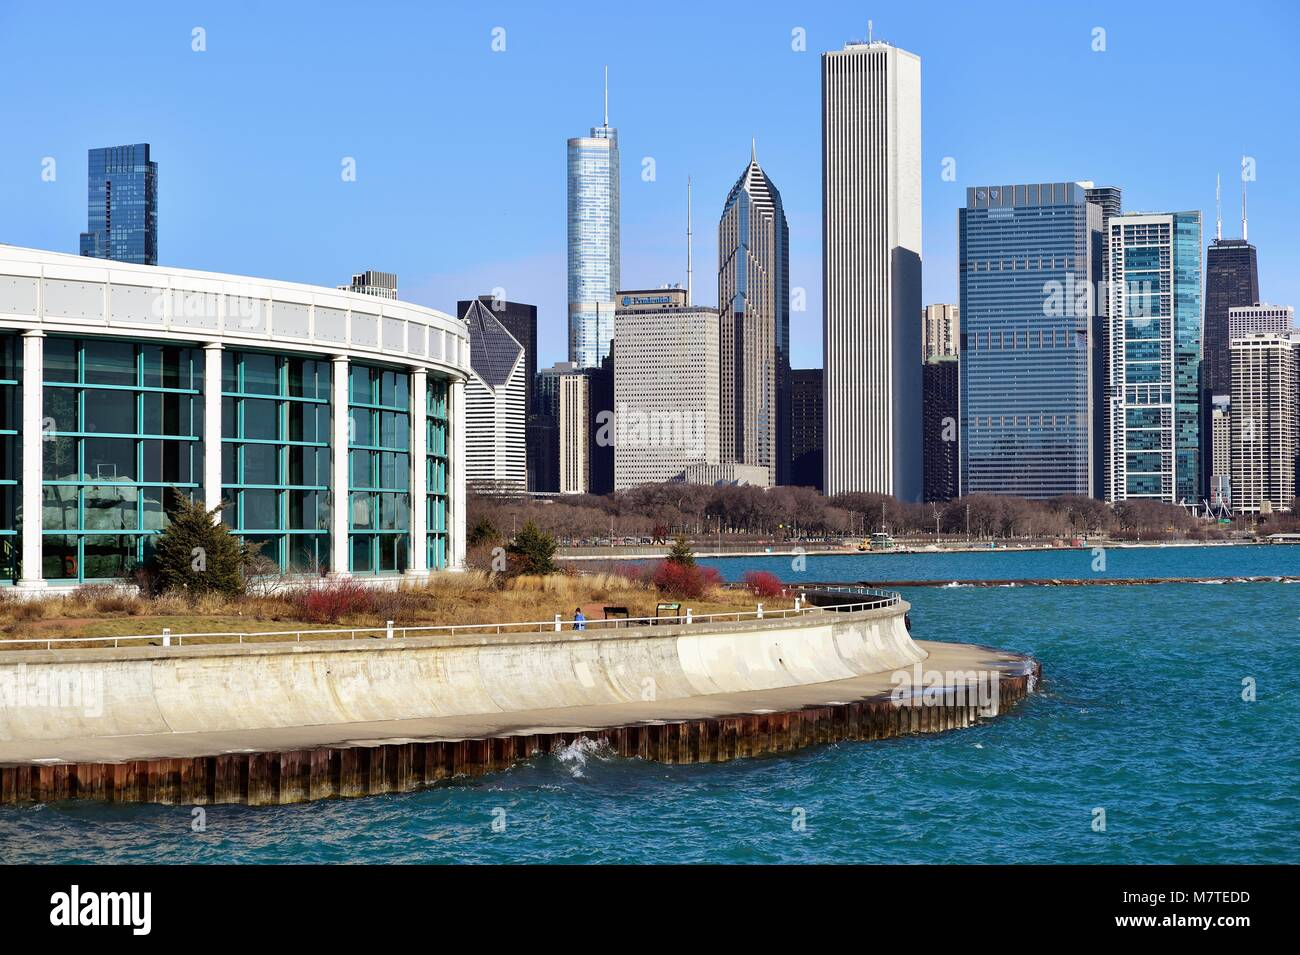 Chicago, Illinois, USA. The Shedd Aquarium, at left, (formally the John G. Shedd Aquarium) in Chicago located just - Stock Image